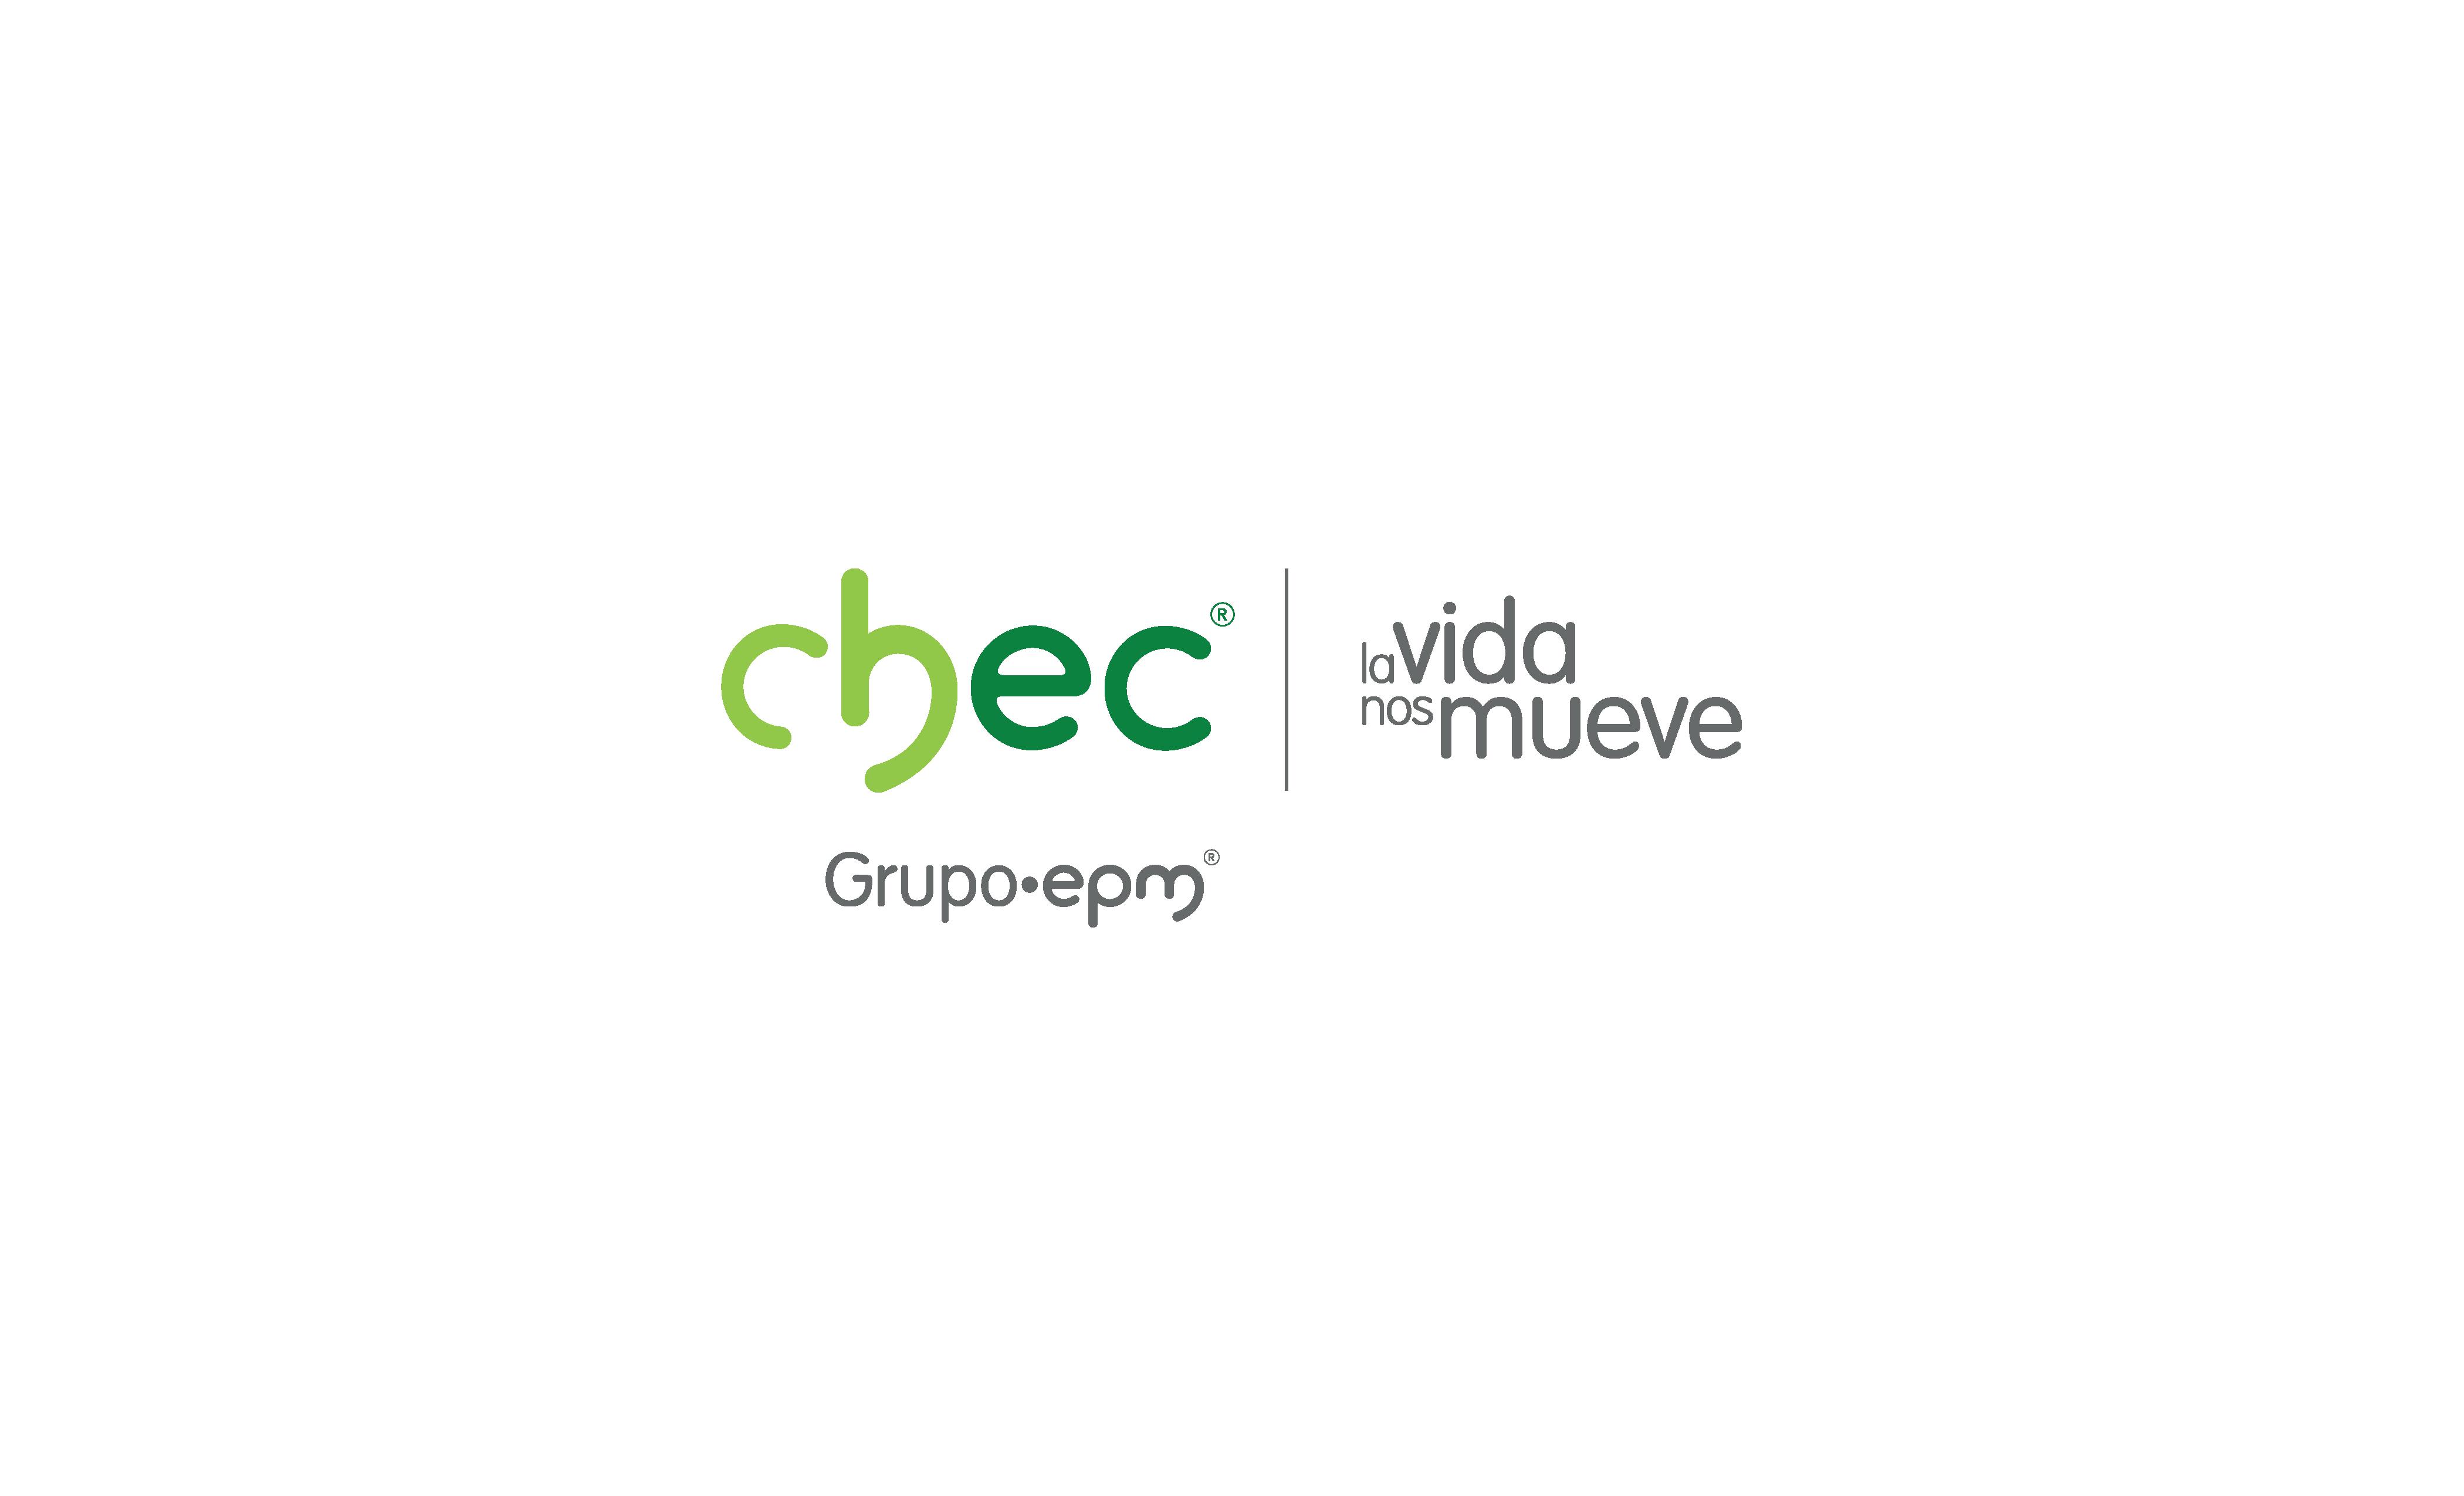 https://0201.nccdn.net/1_2/000/000/0db/5d3/logo-chec--01.png